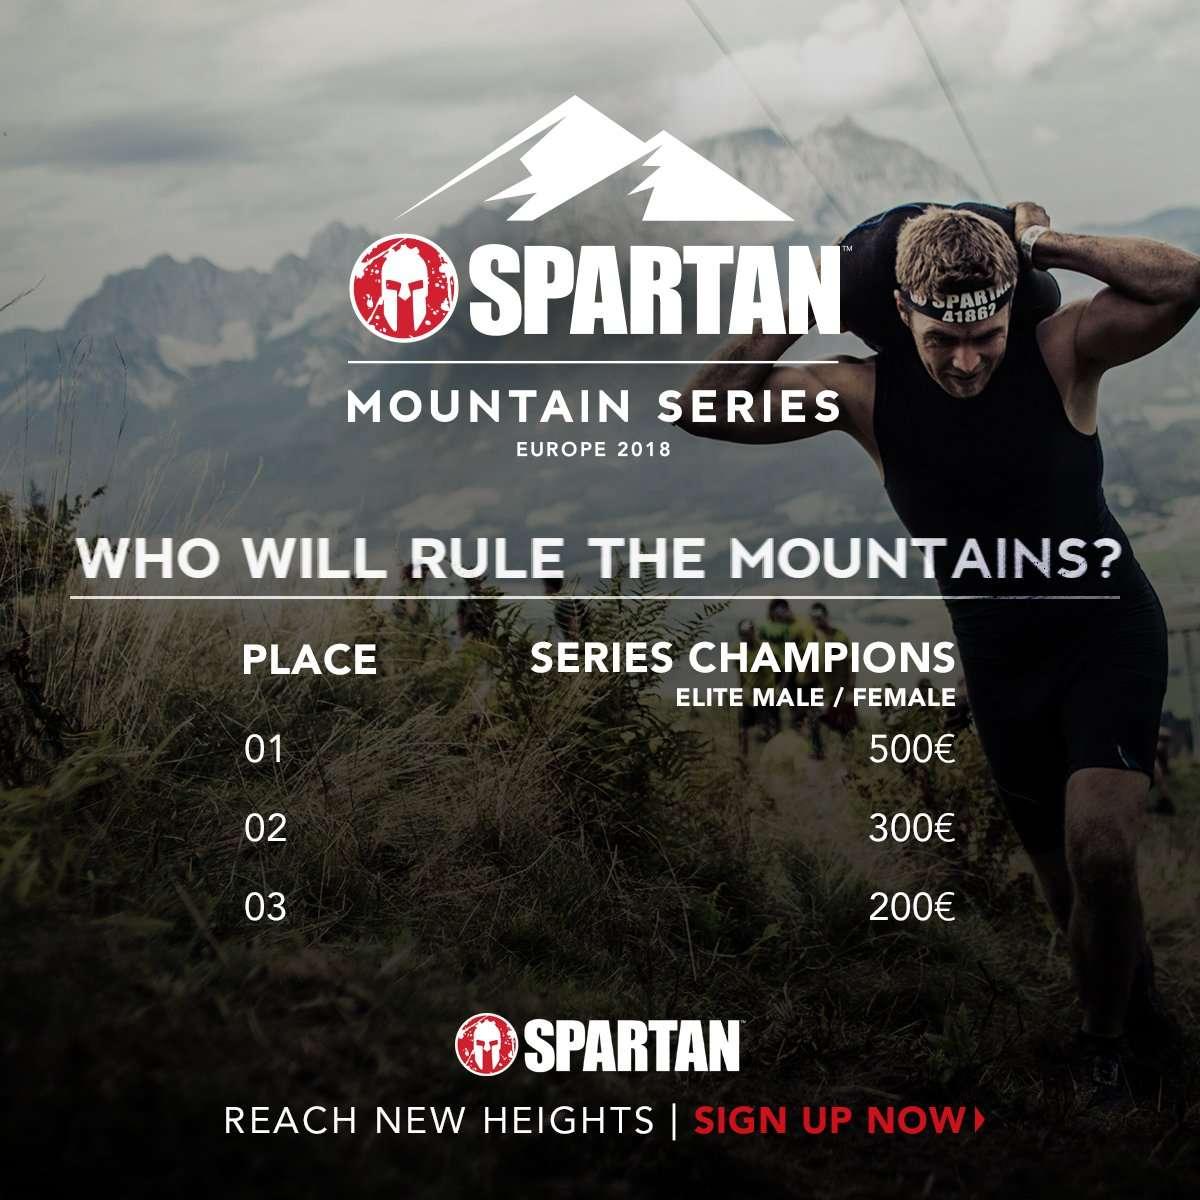 spartan mountain series